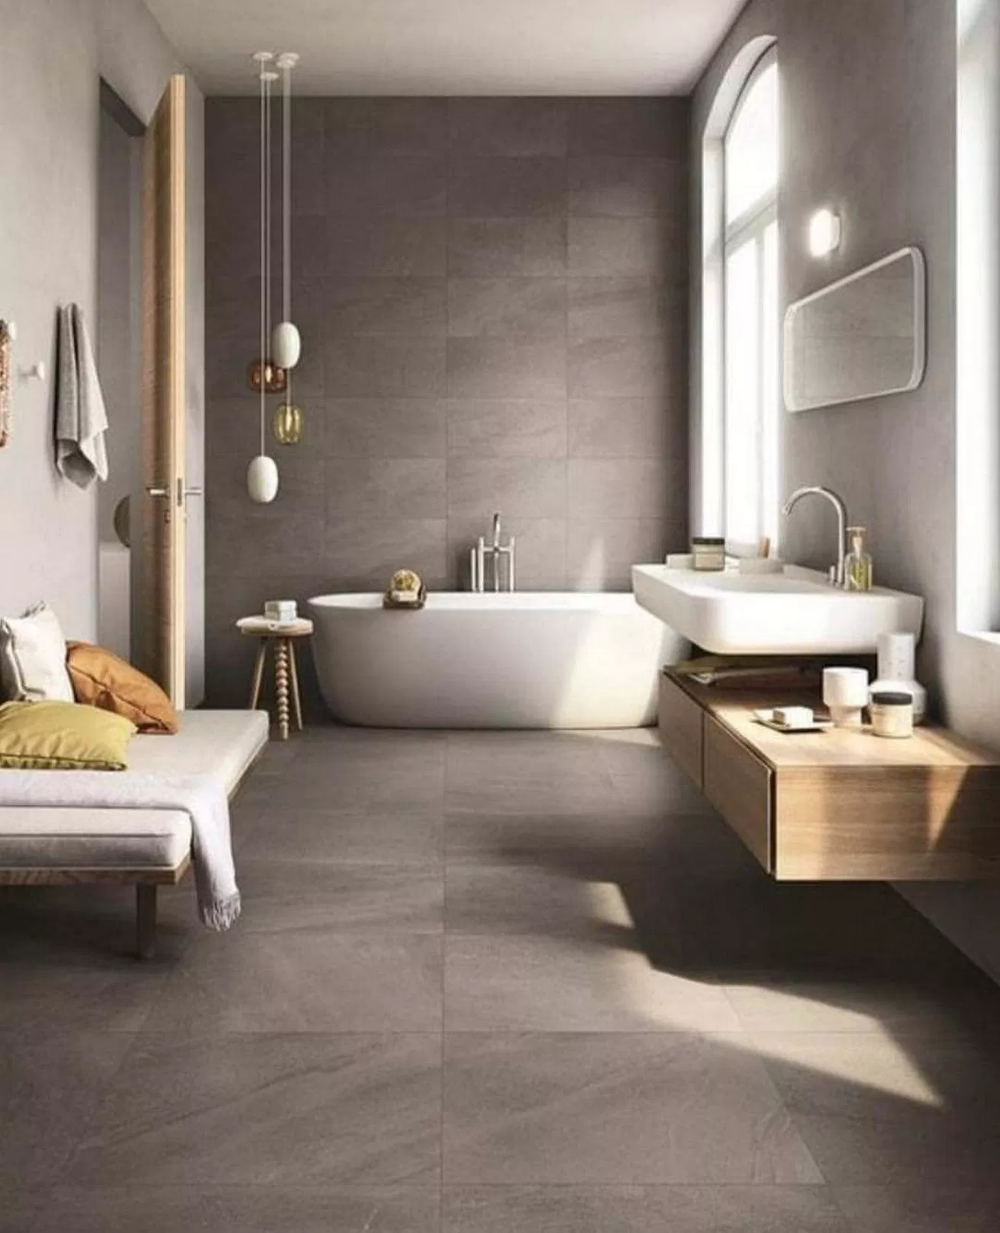 Zen Bathroomdesign Ideas:  Make Your Bath Look Stylish With These 64 Minimalist